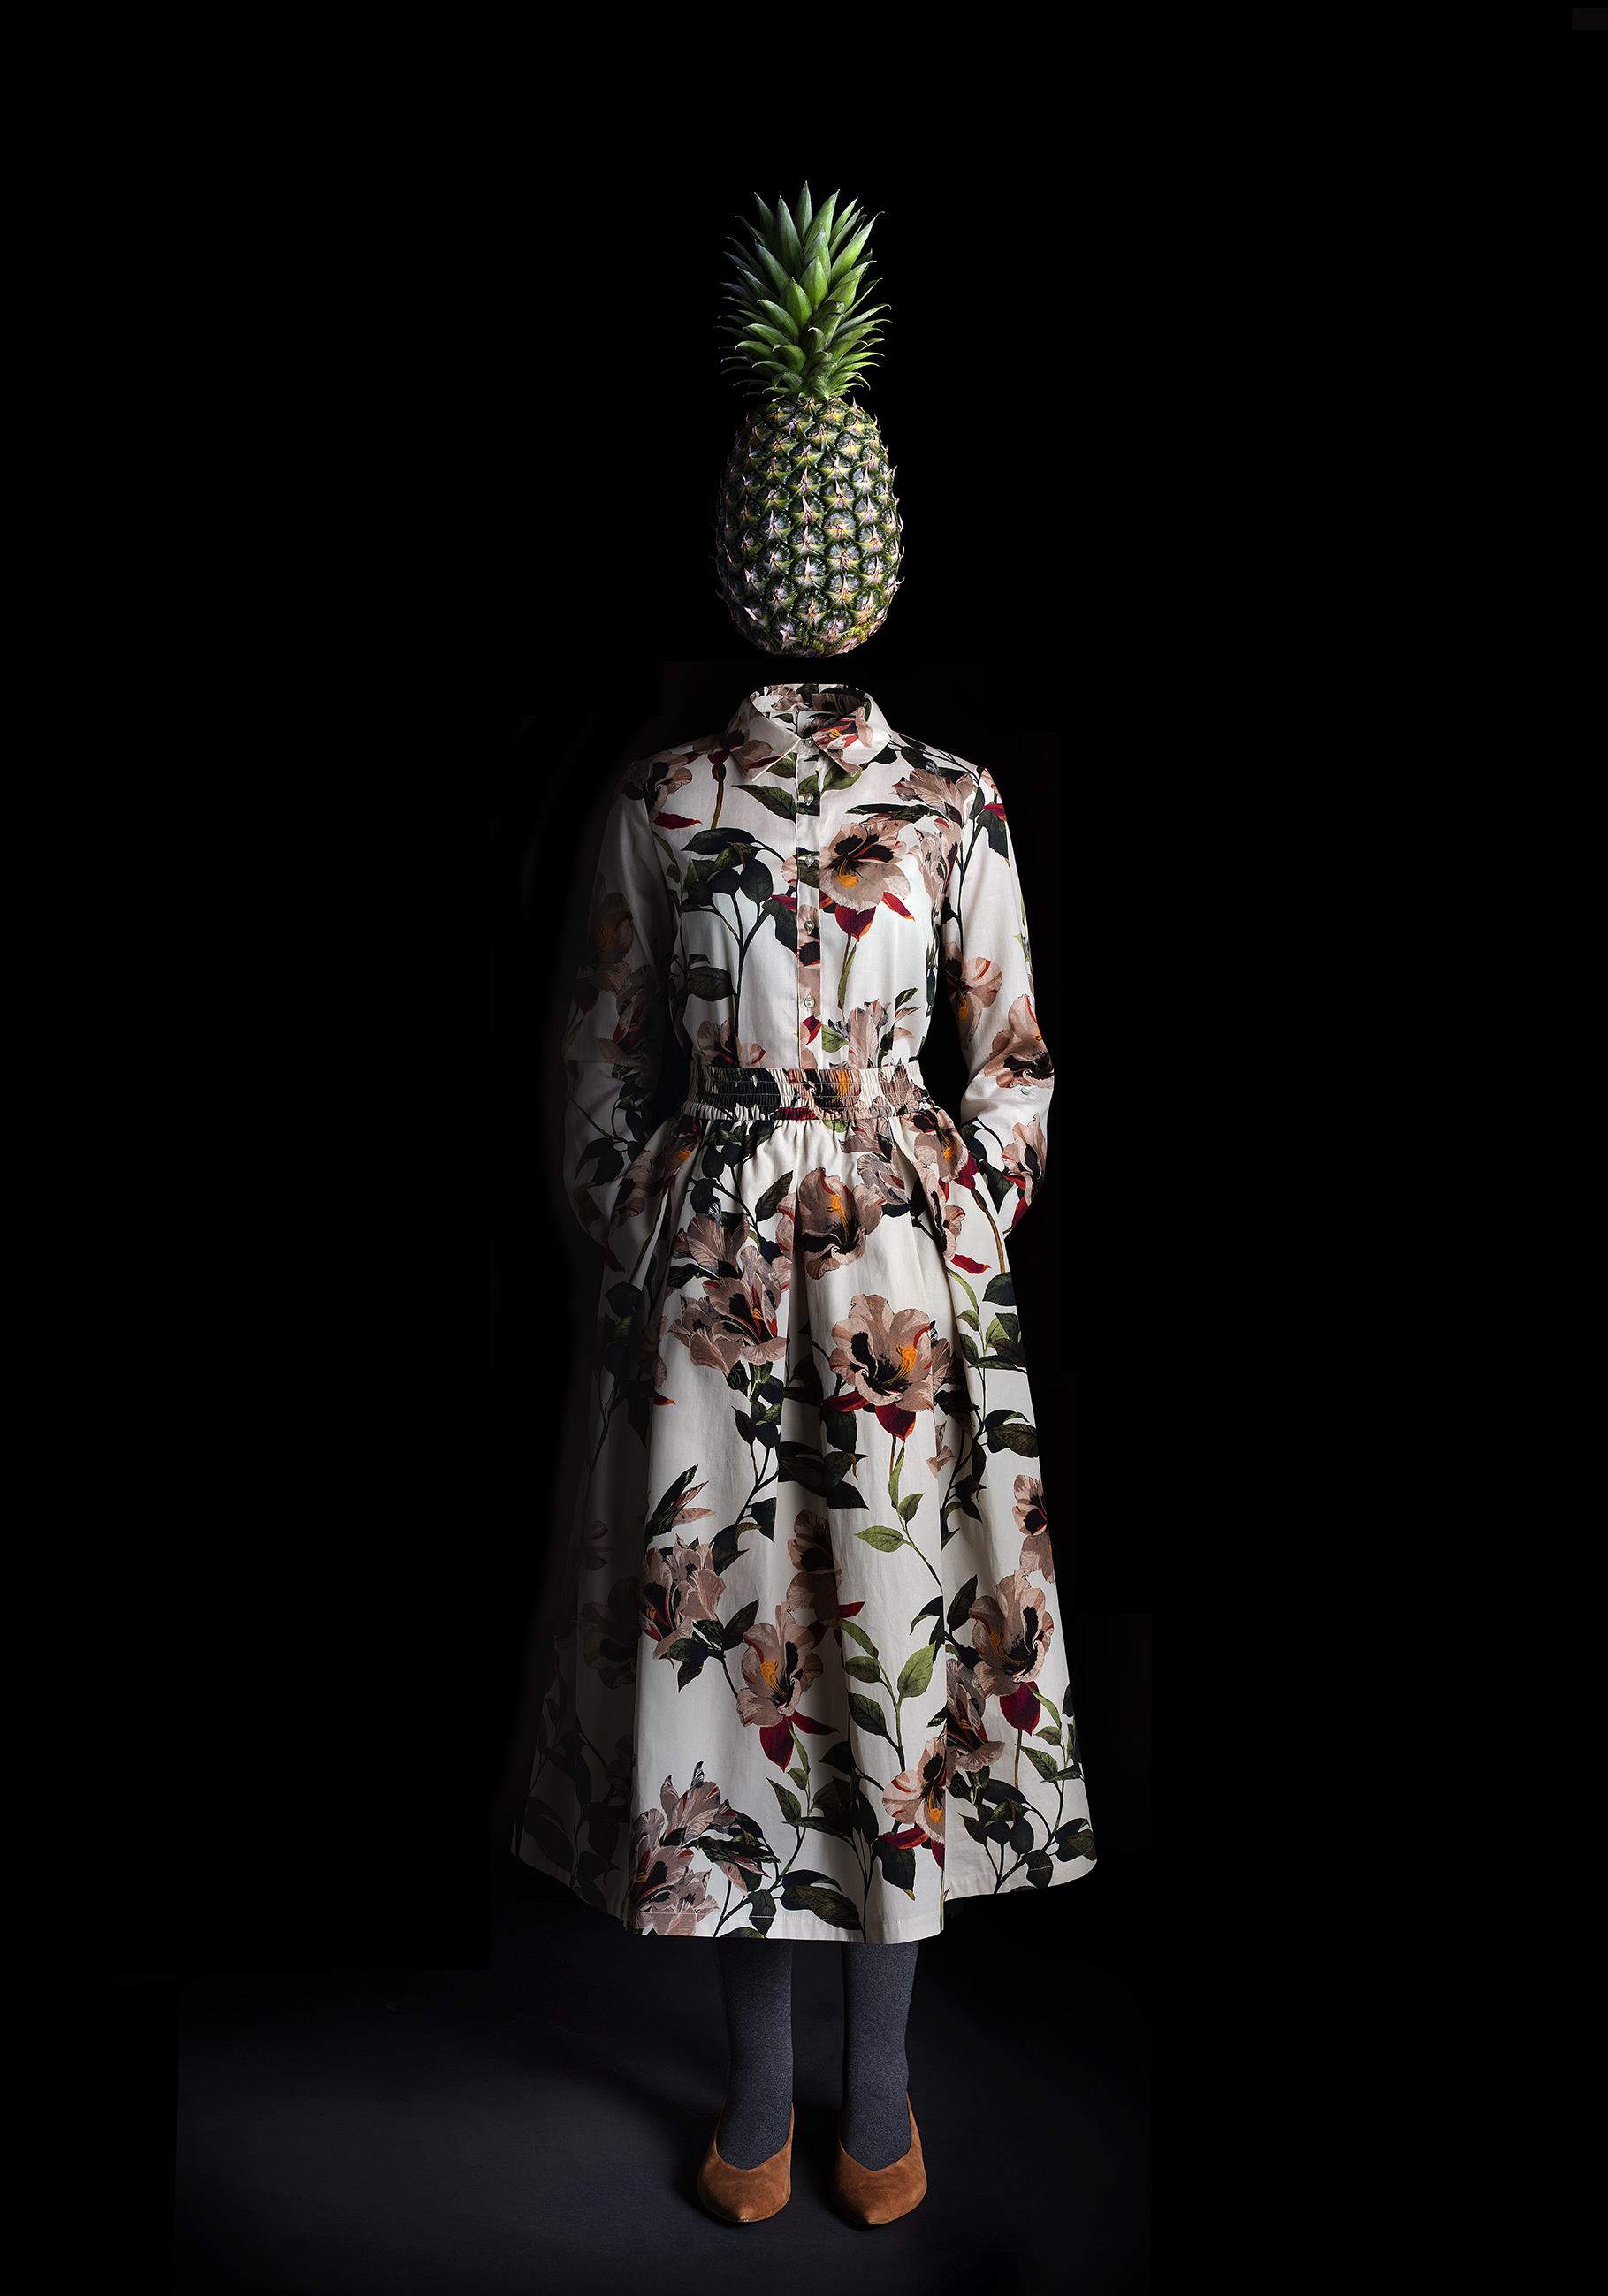 Ceci n'est pas un ananas